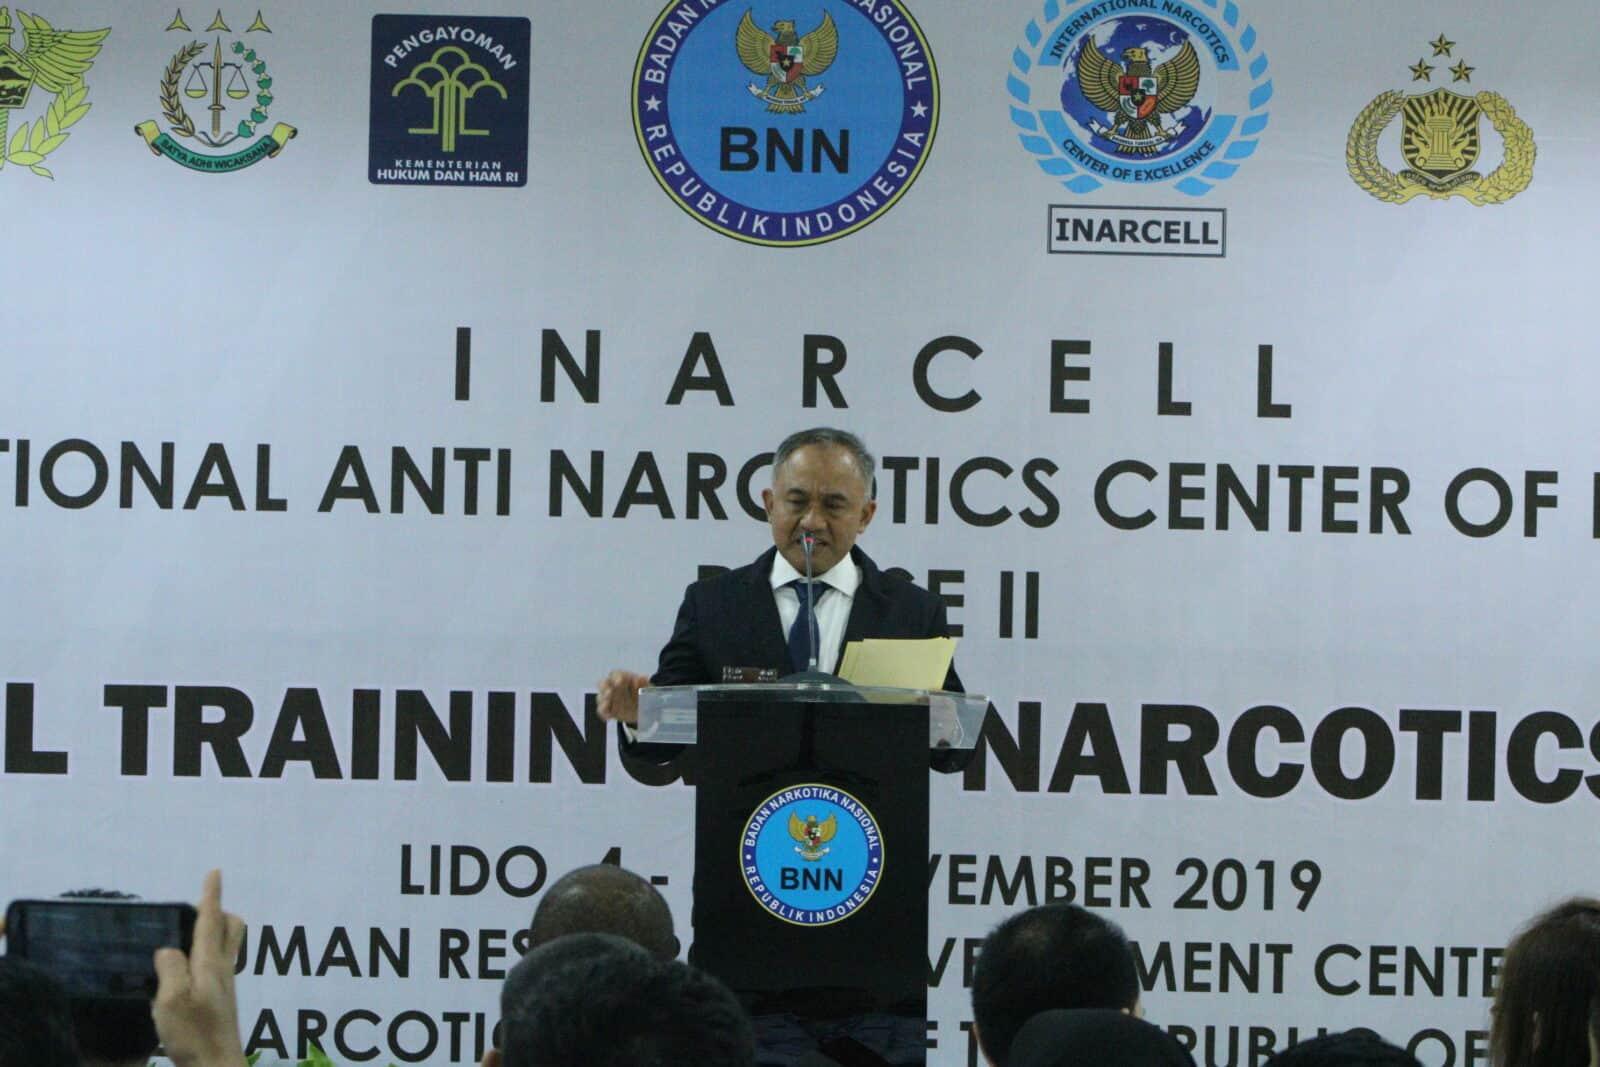 International Training of Narcotics Enforcement